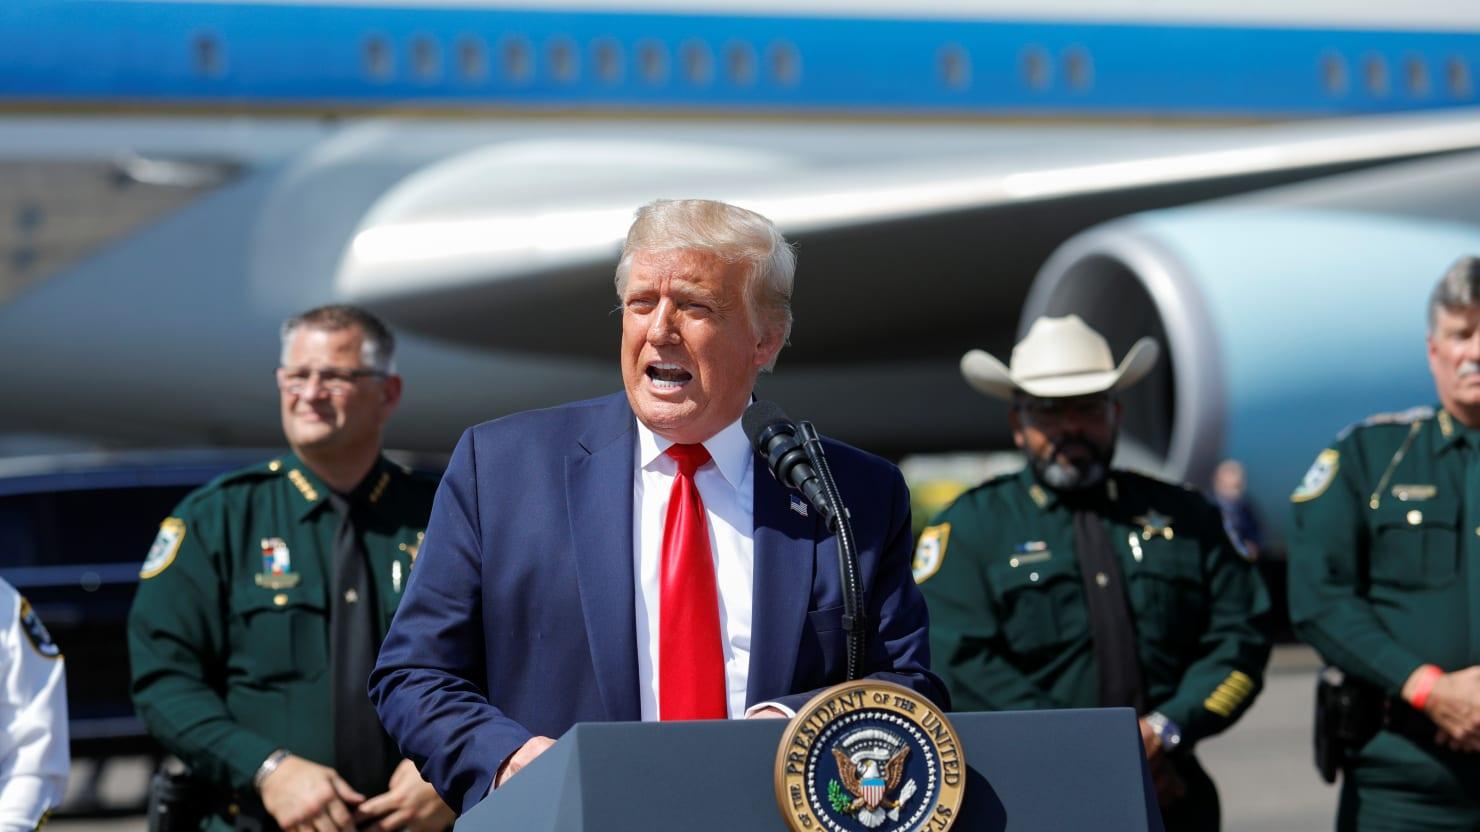 Trump Turns Coronavirus Roundtable Into Mask-Free Campaign Rally